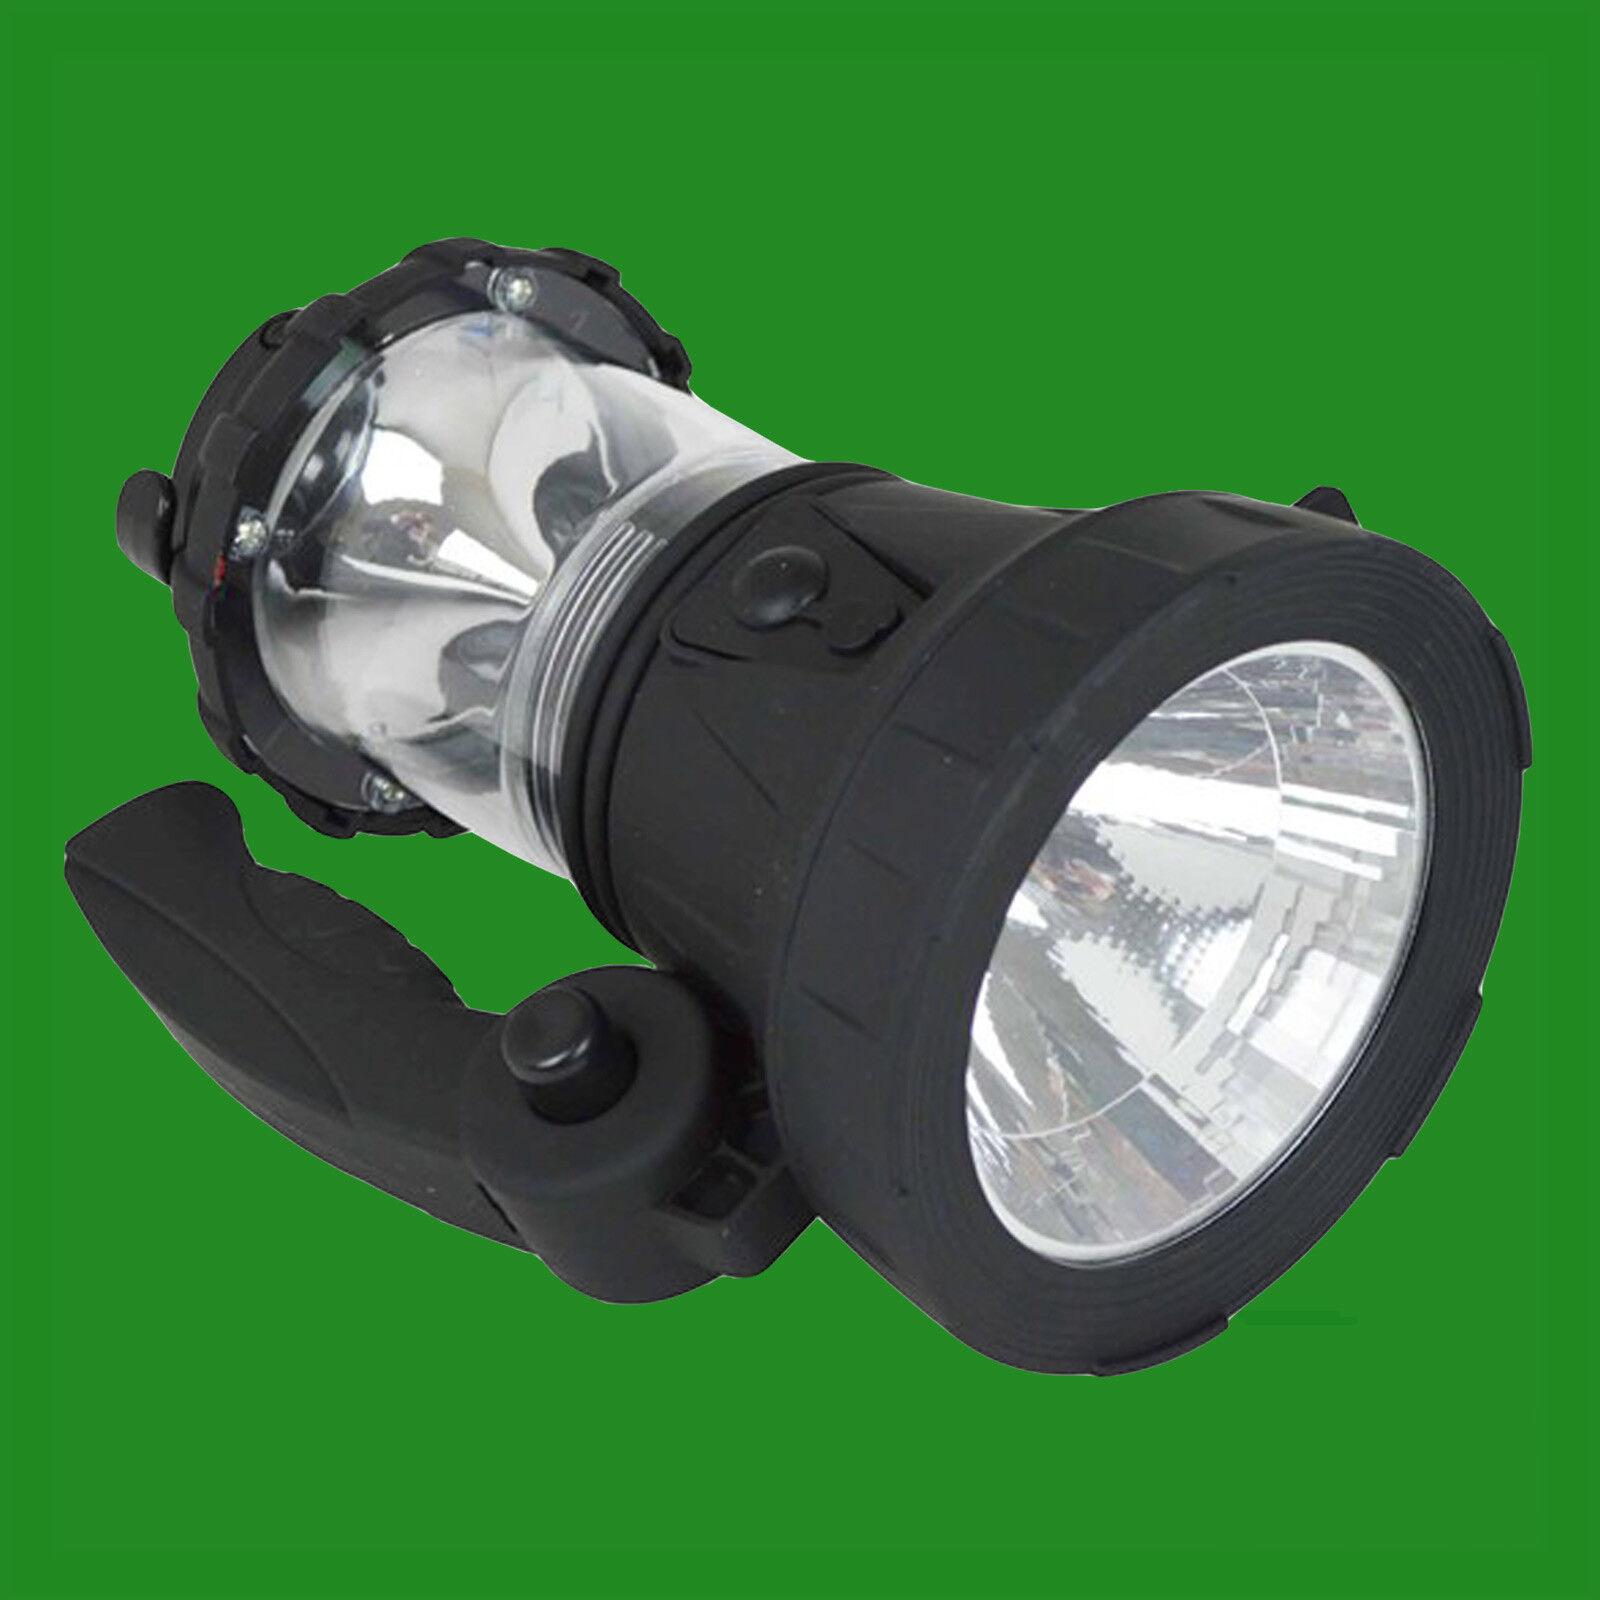 Led Voyage Rechargeable Multi Usage Lanterne Spot Torche, Camping & Voyage Led 2b9867